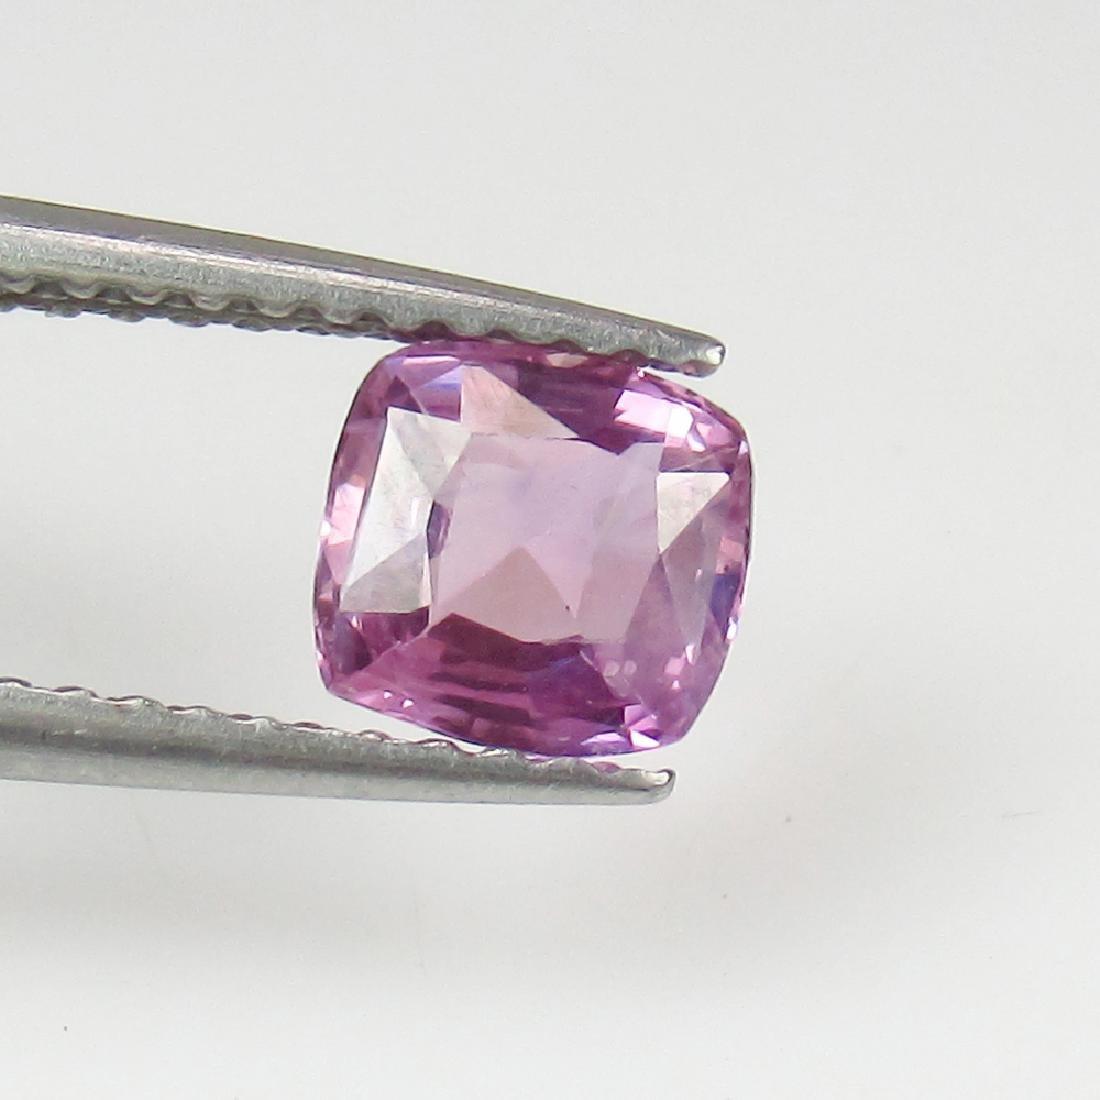 0.77 Ct Genuine Ceylon Unheated Sweet Pink Sapphire Top